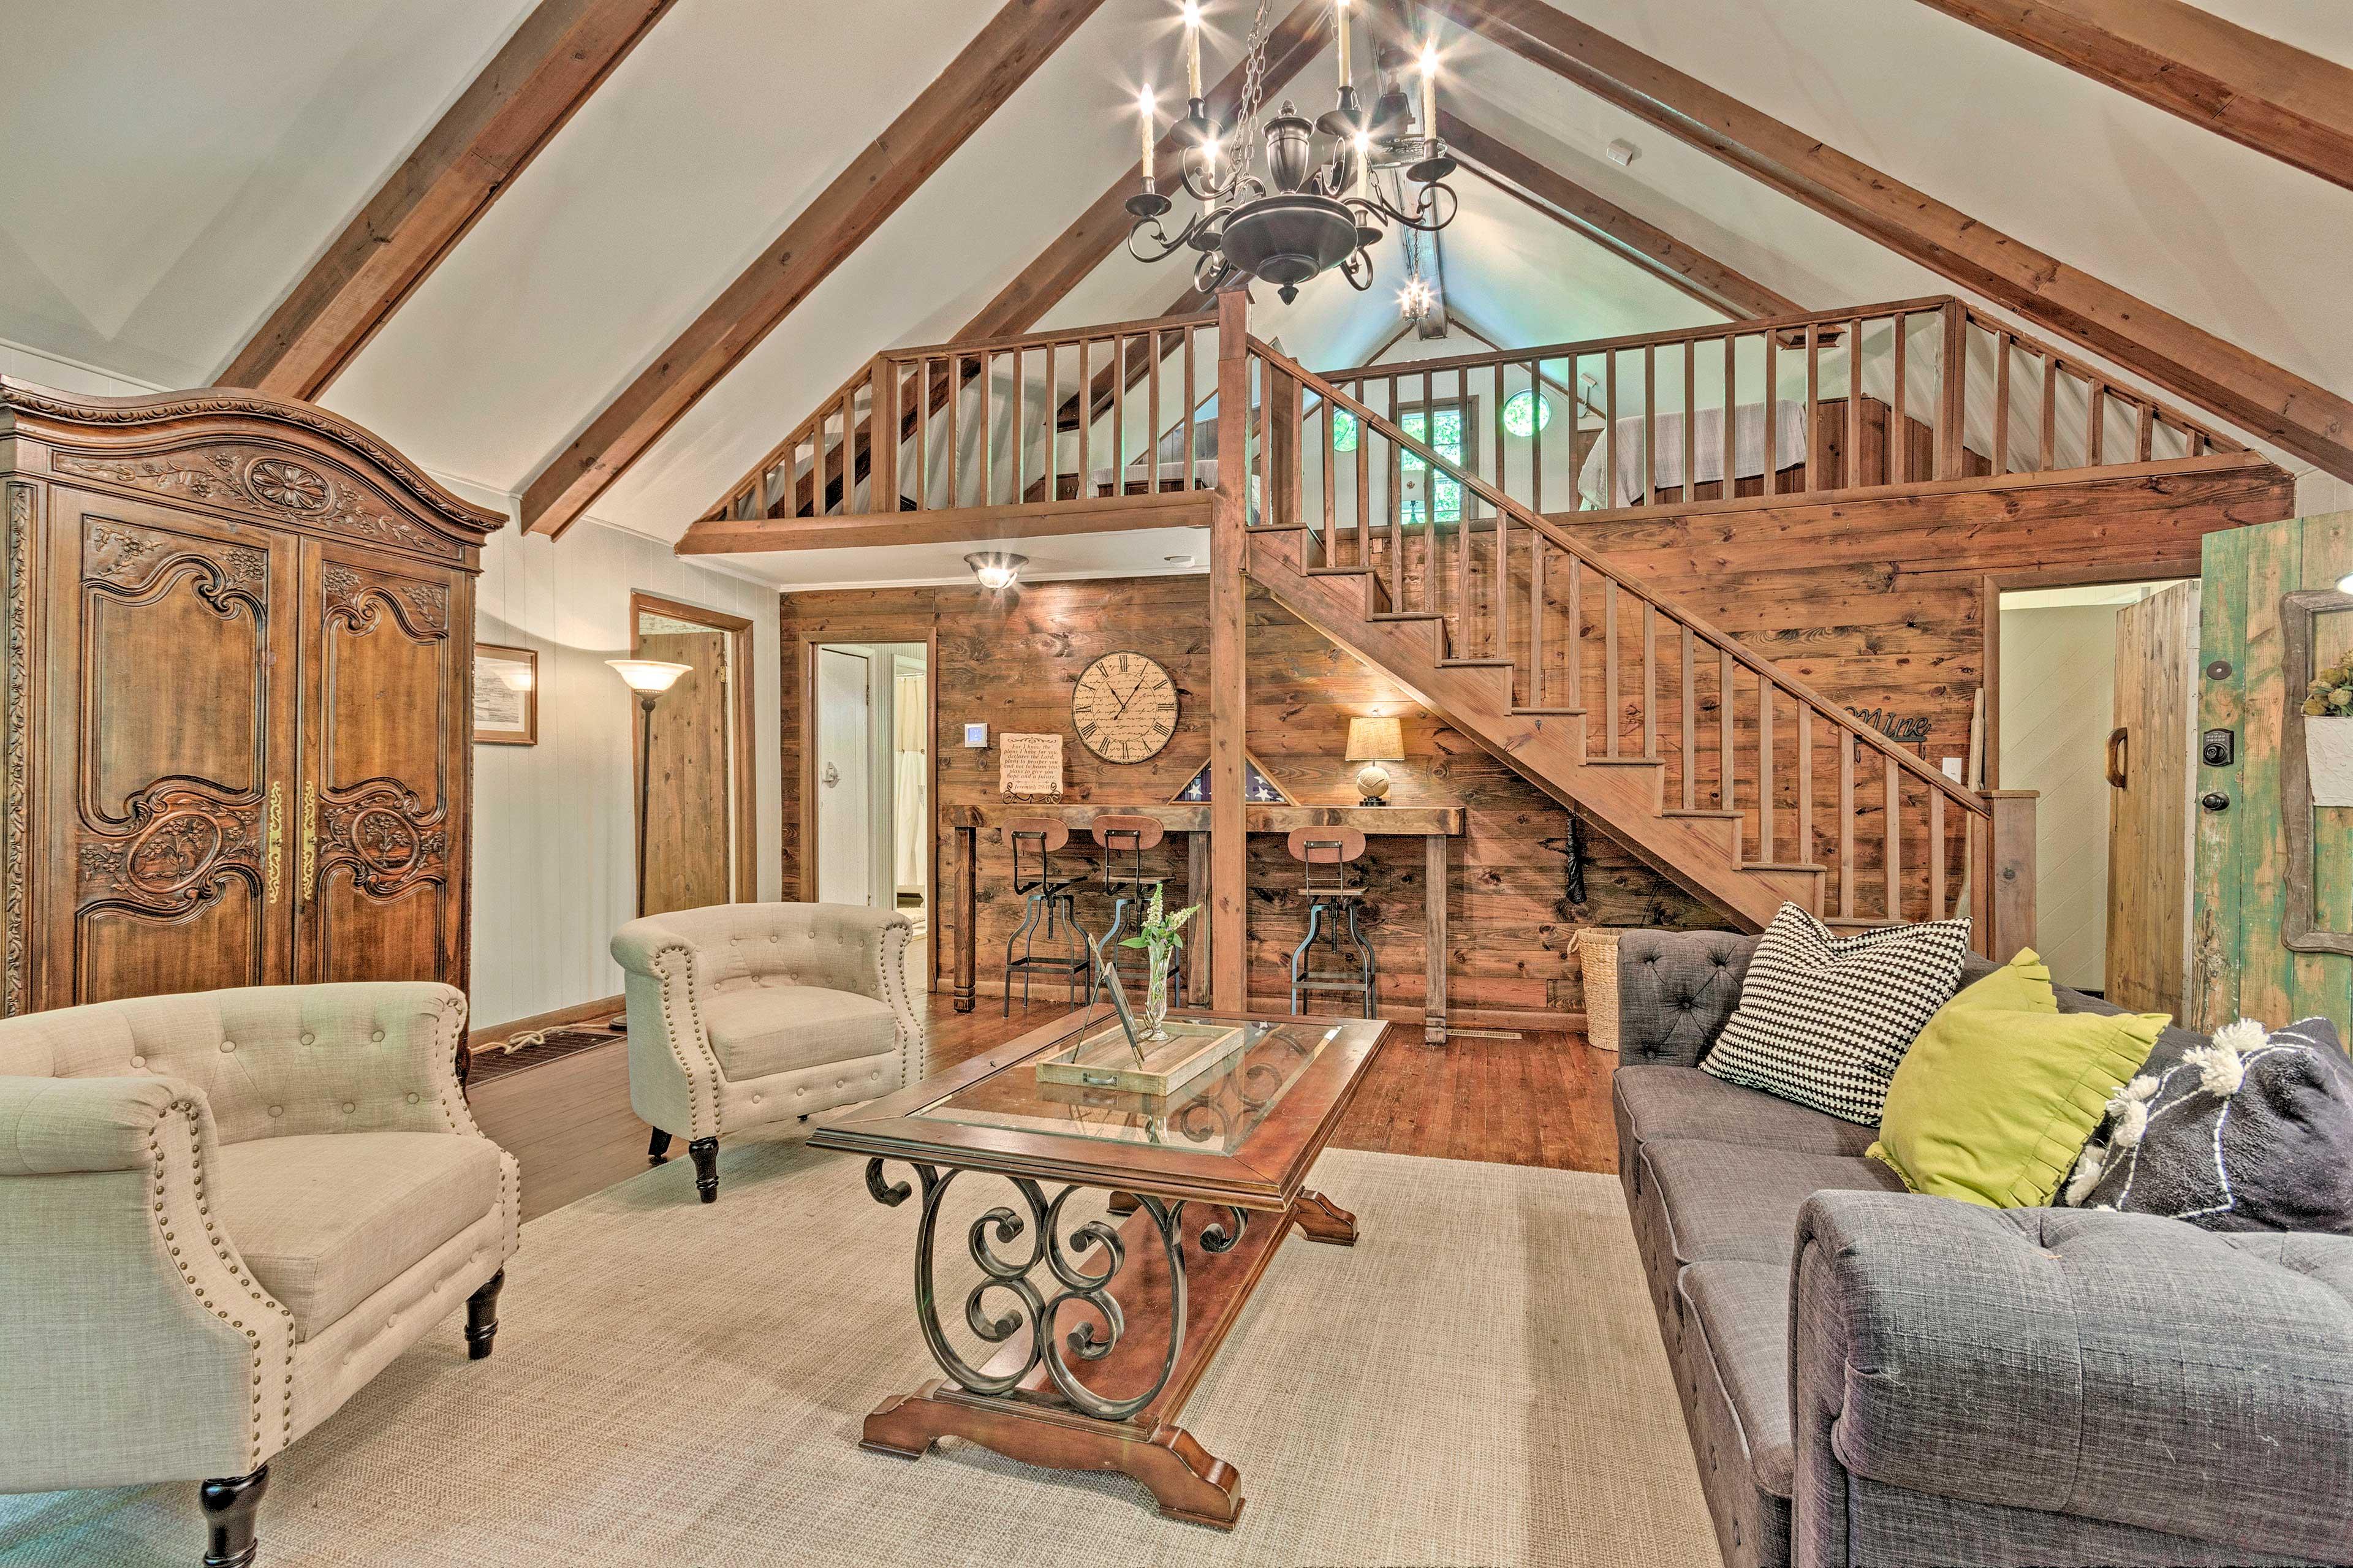 The open layout boasts hardwood floors and a loft!